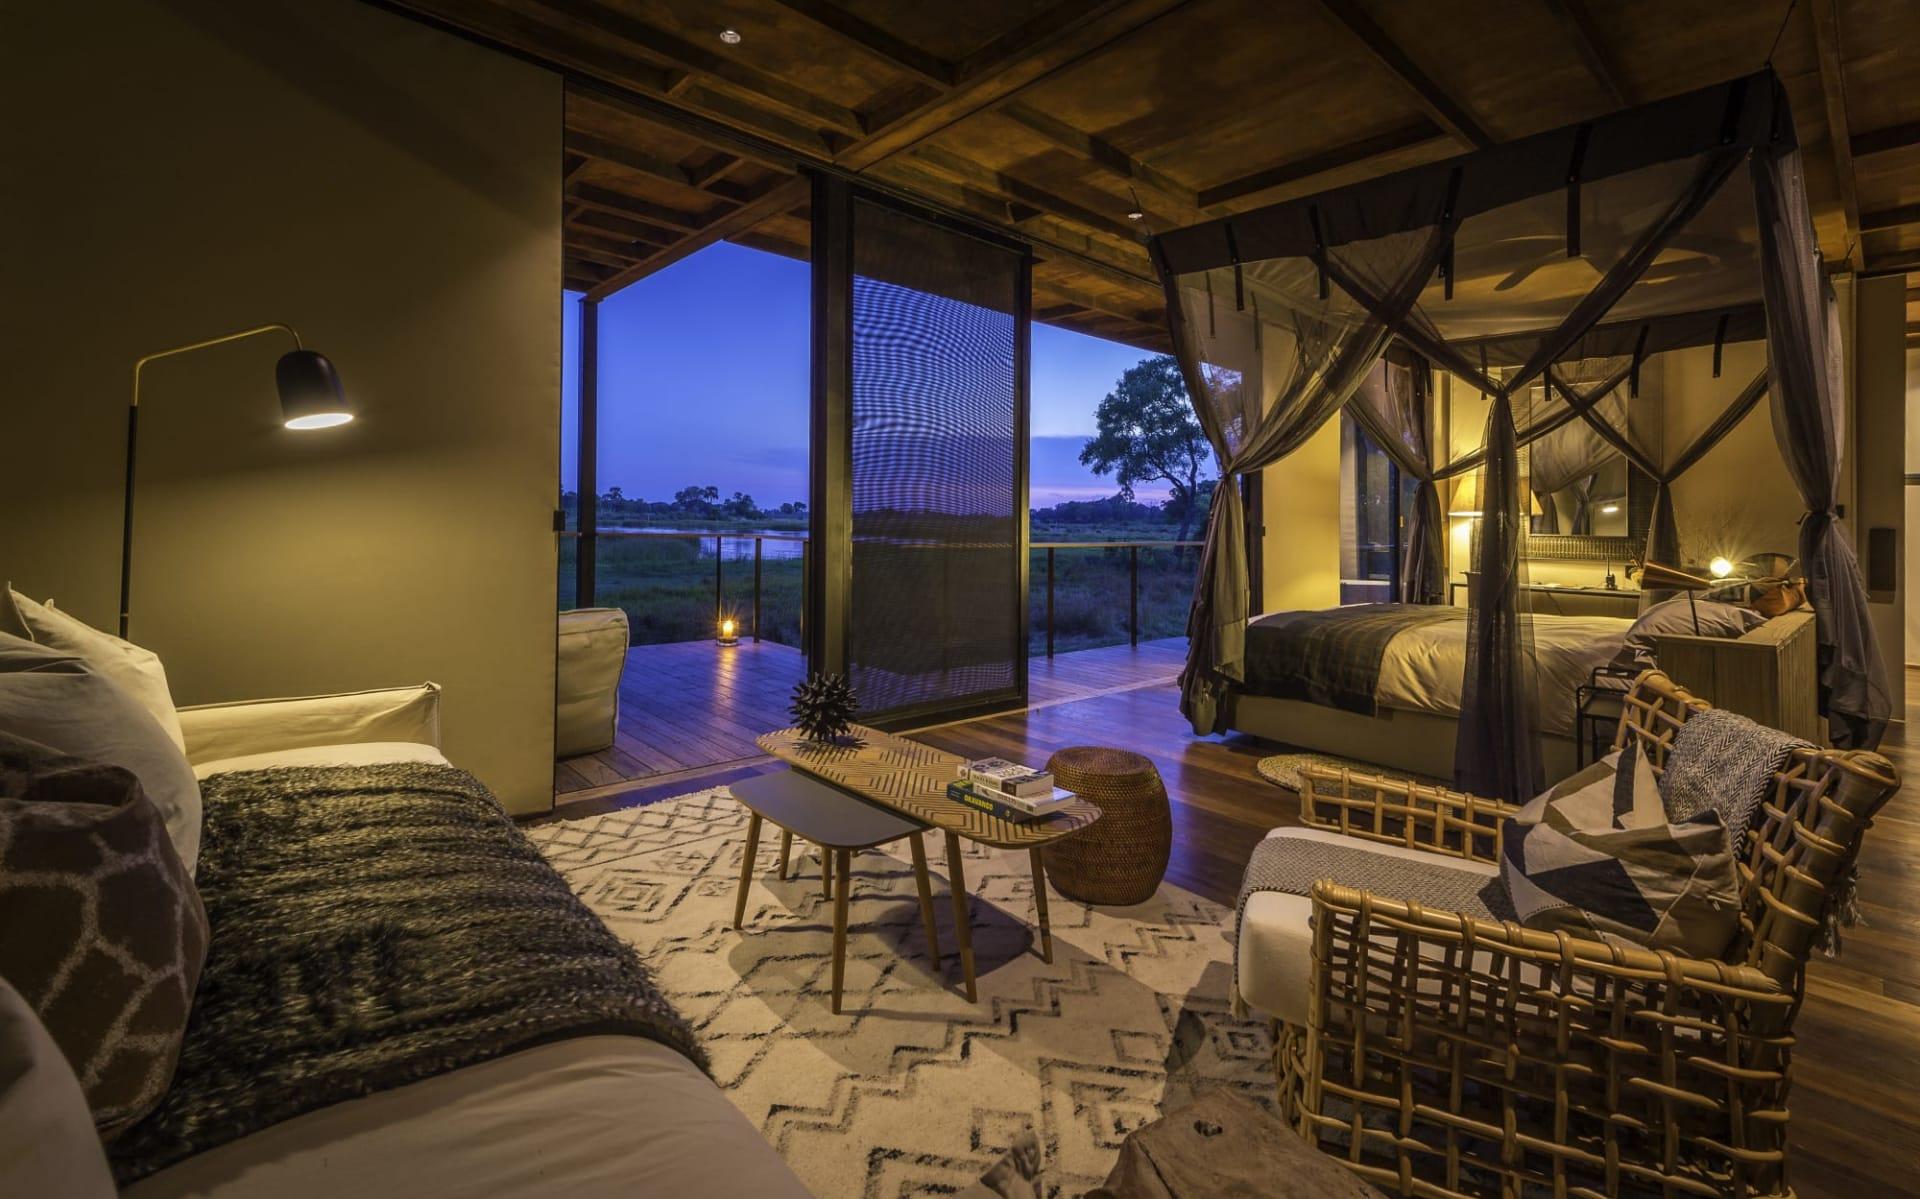 Qorokwe Camp in Okavango Delta: Qorokwe Camp - Bett mit Terrasse c Wilderness Safaris